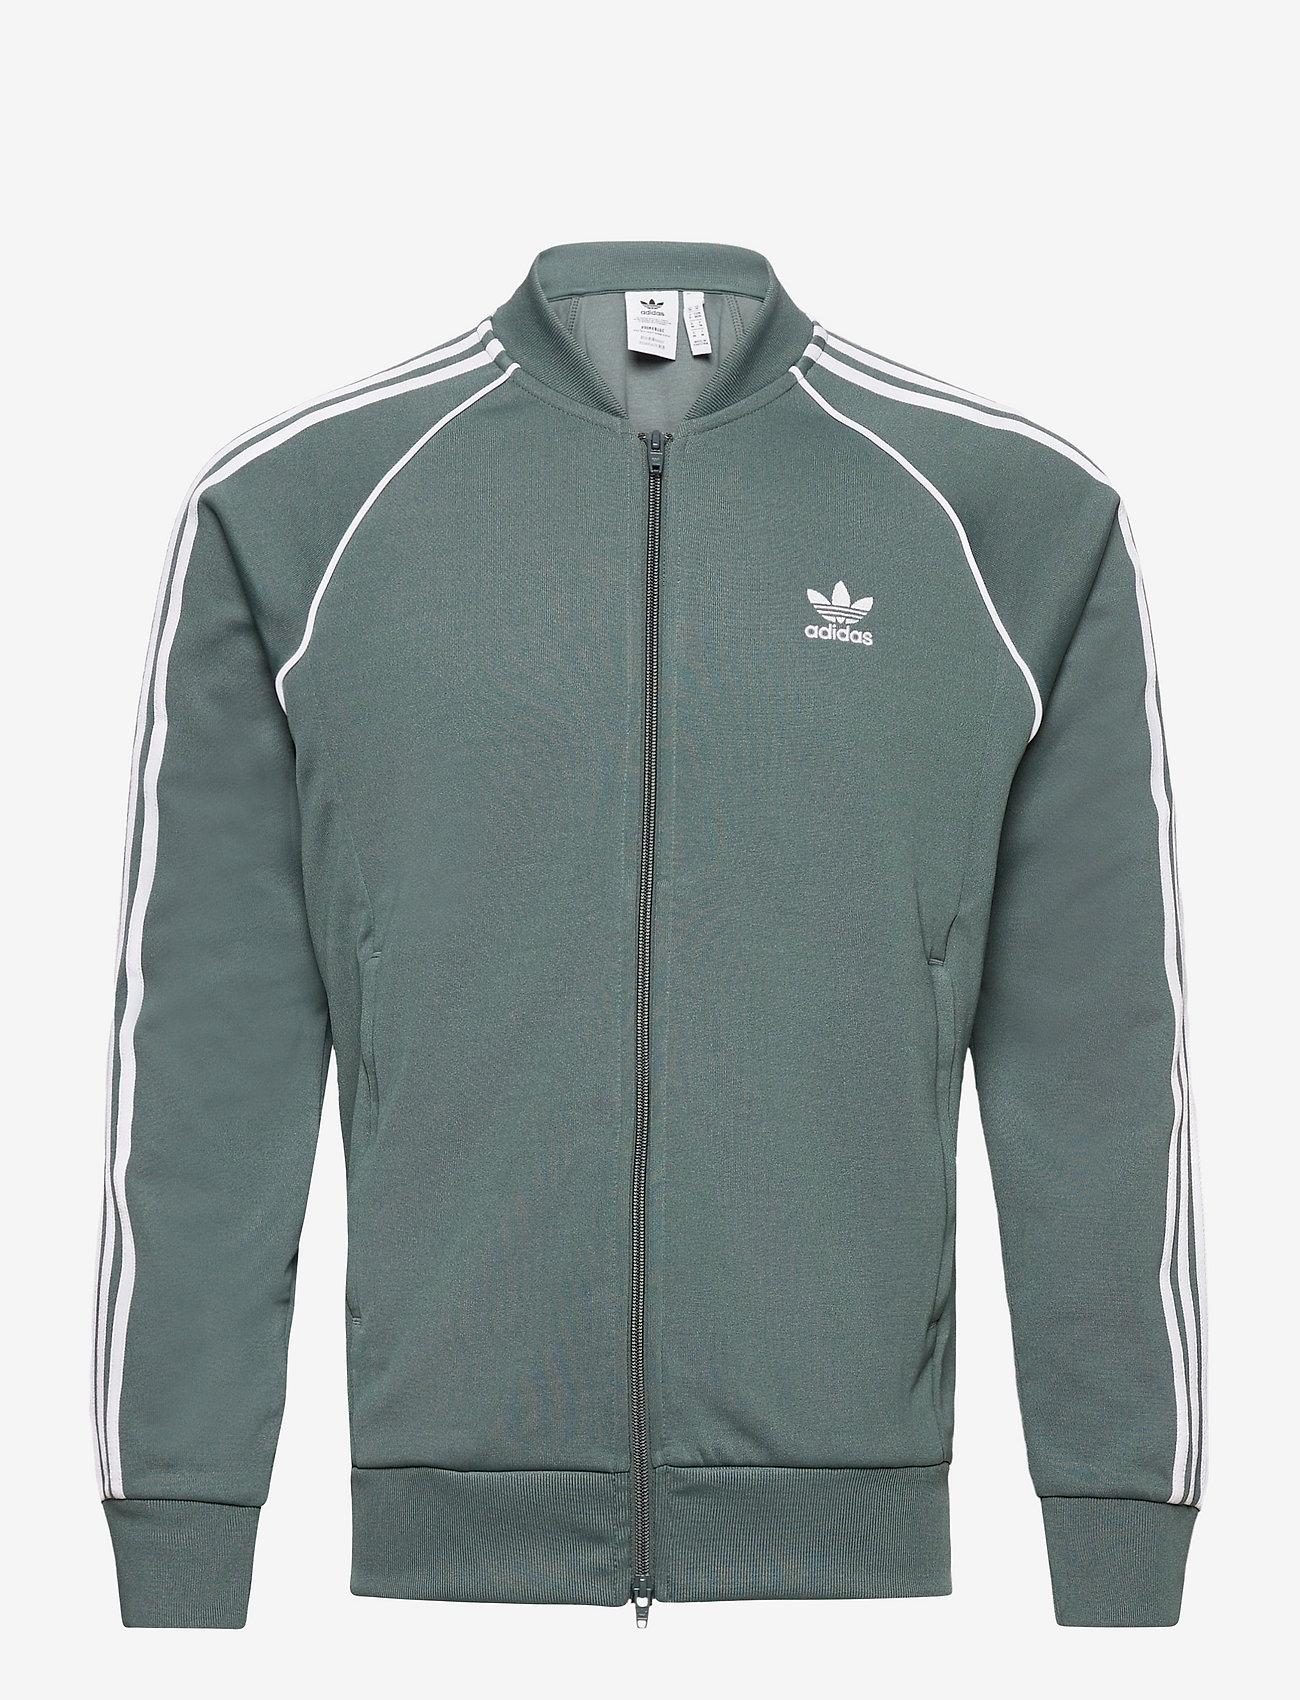 adidas Originals - Adicolor Classics Primeblue SST Track Jacket - basic sweatshirts - bluoxi - 1